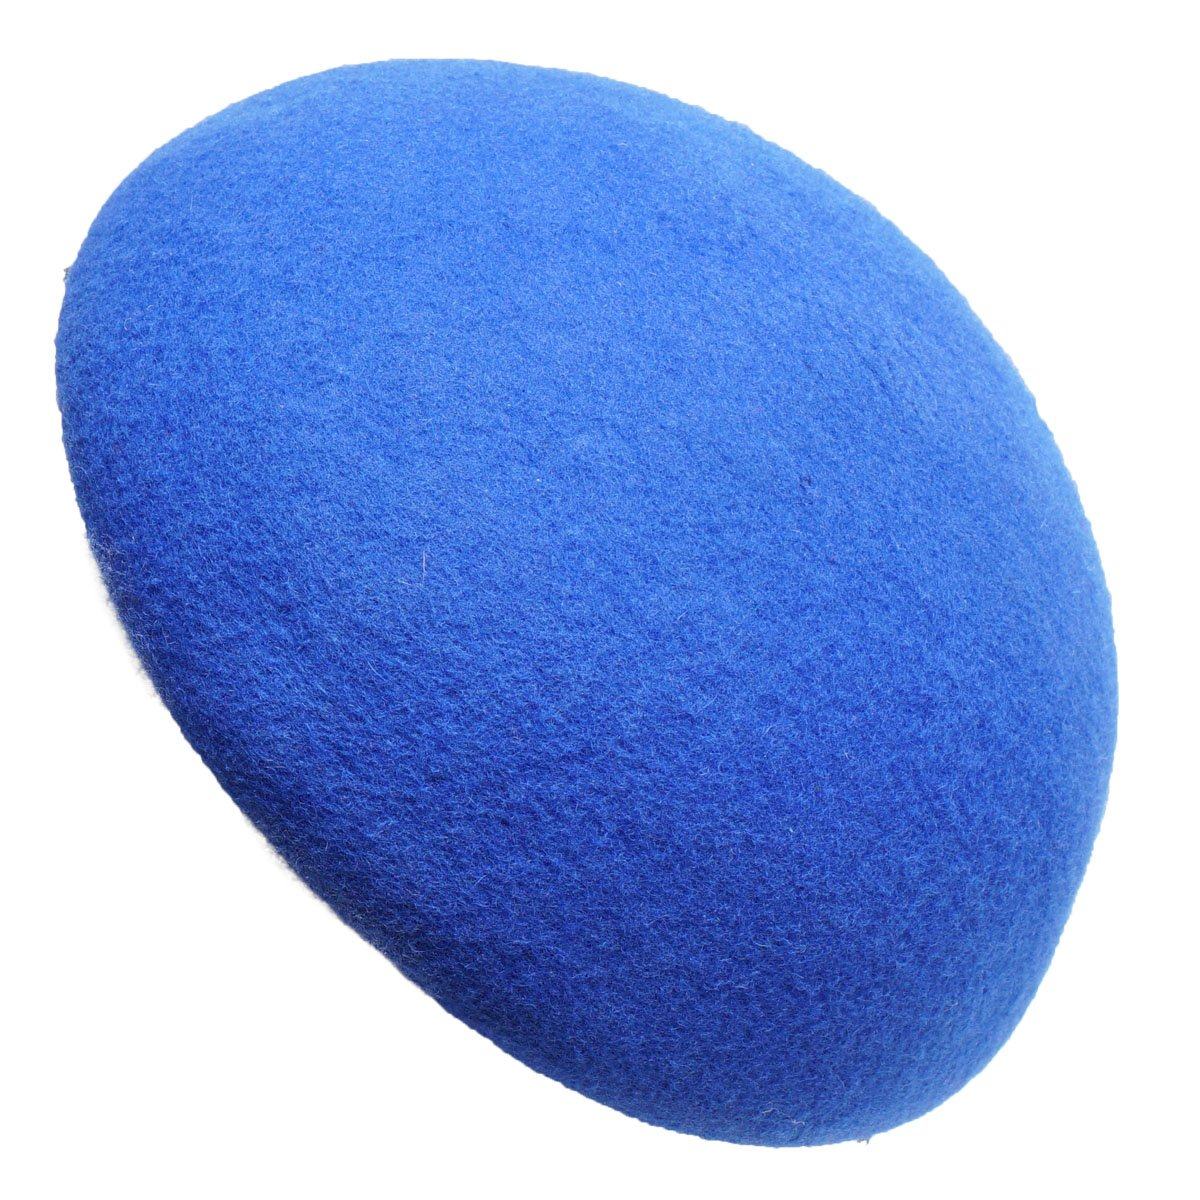 Lawliet Damen Fedora & Trilby Einheitsgröße blau A263Blue